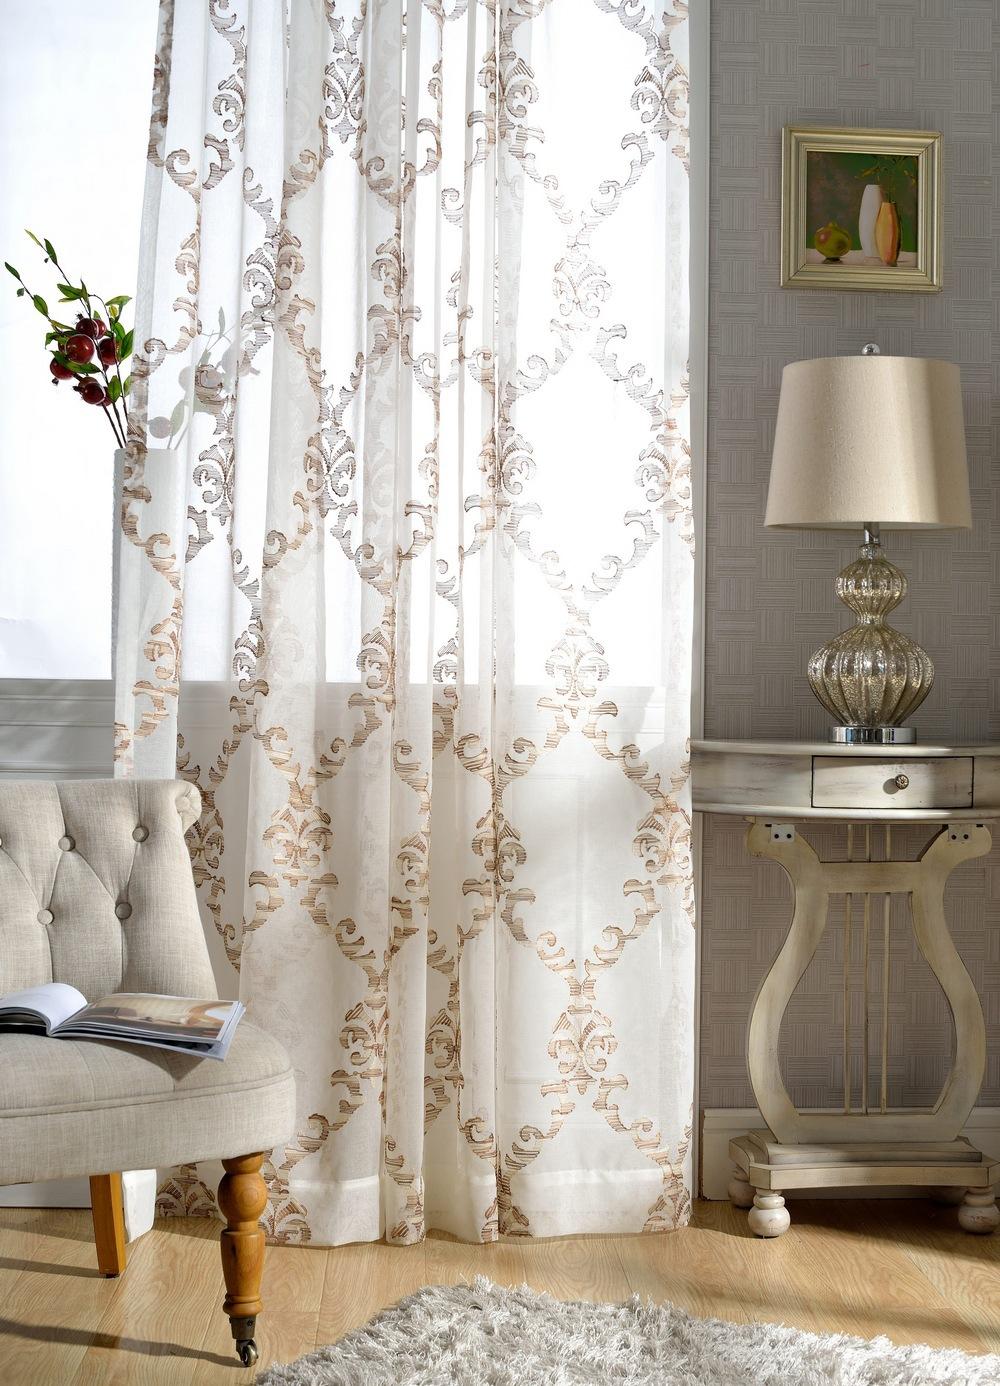 acquista all 39 ingrosso online puro tessuto ricamato da grossisti puro tessuto ricamato cinesi. Black Bedroom Furniture Sets. Home Design Ideas